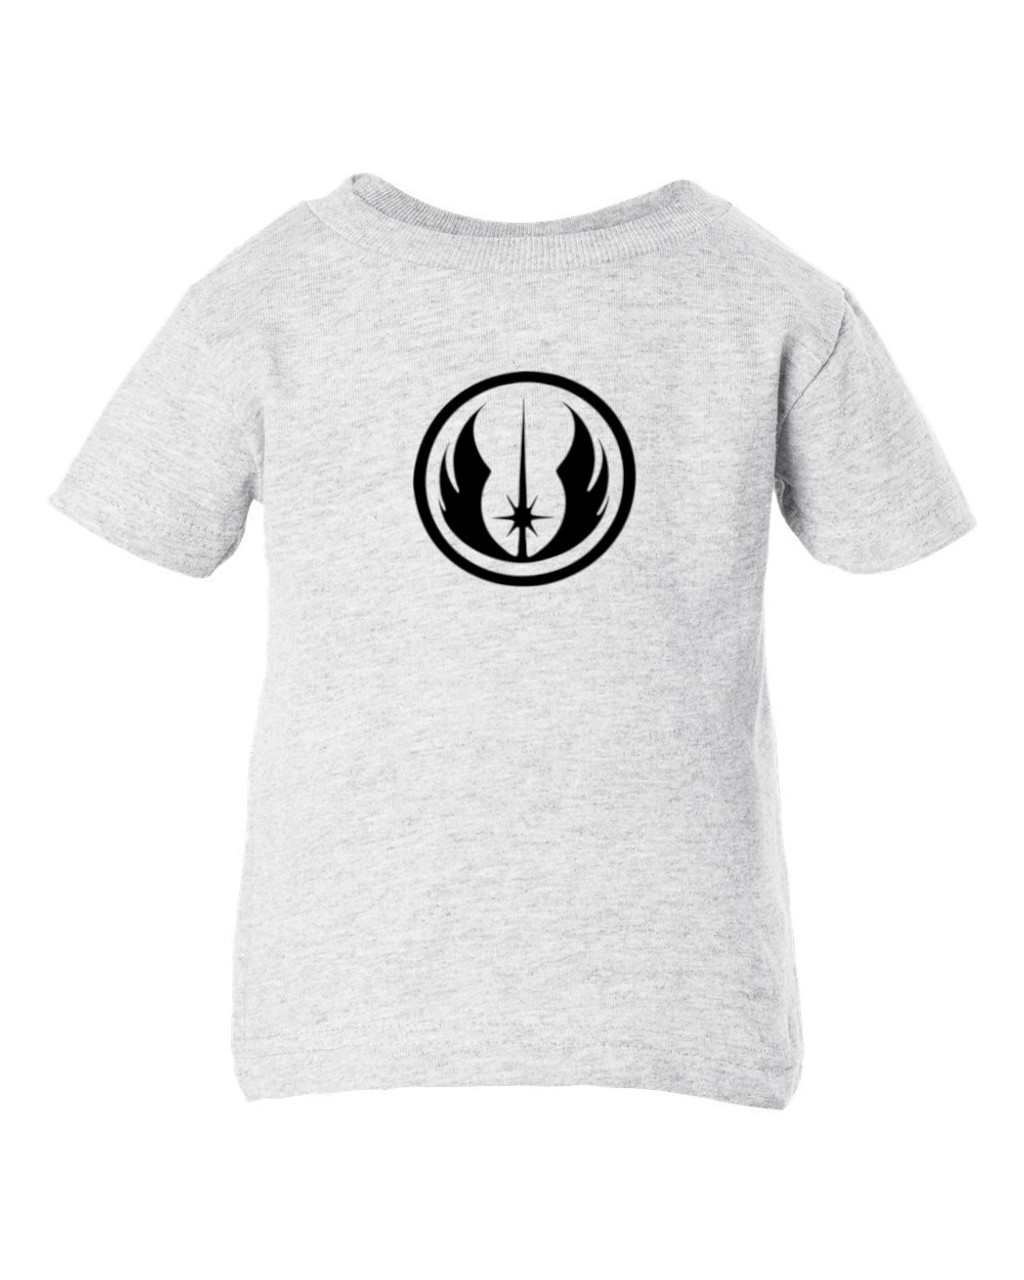 Jedi Order Symbol & Emblem Baby Toddler Cotton Ash T-Shirt